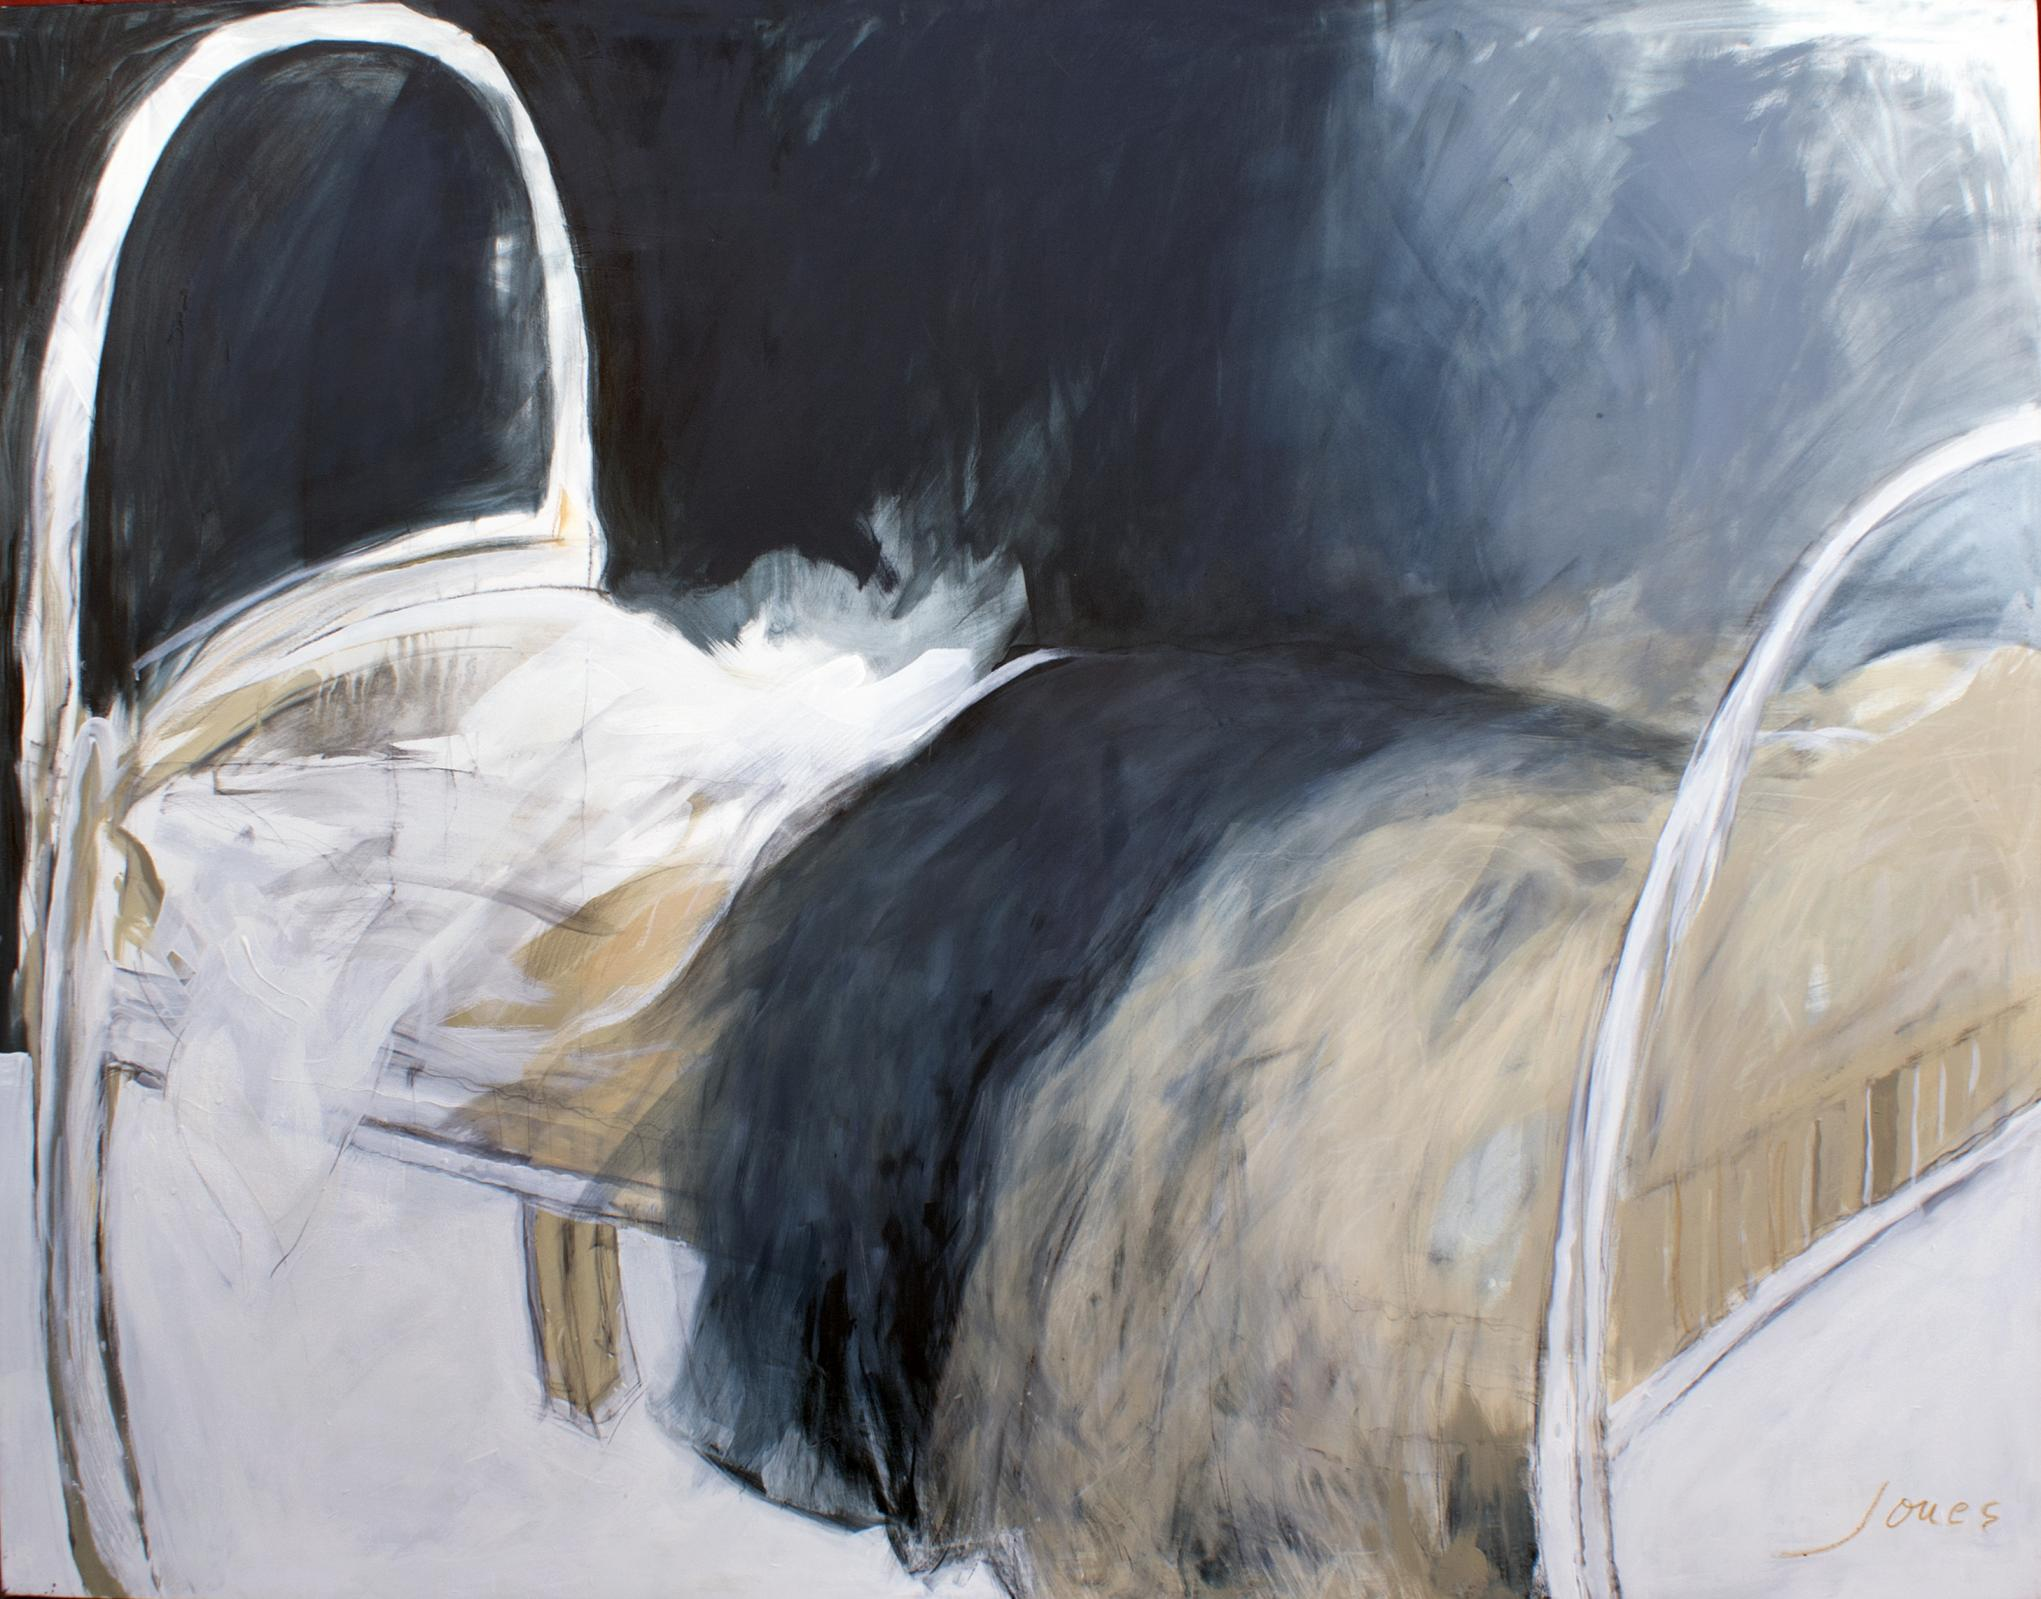 La cama (2014) - Virginia Jones